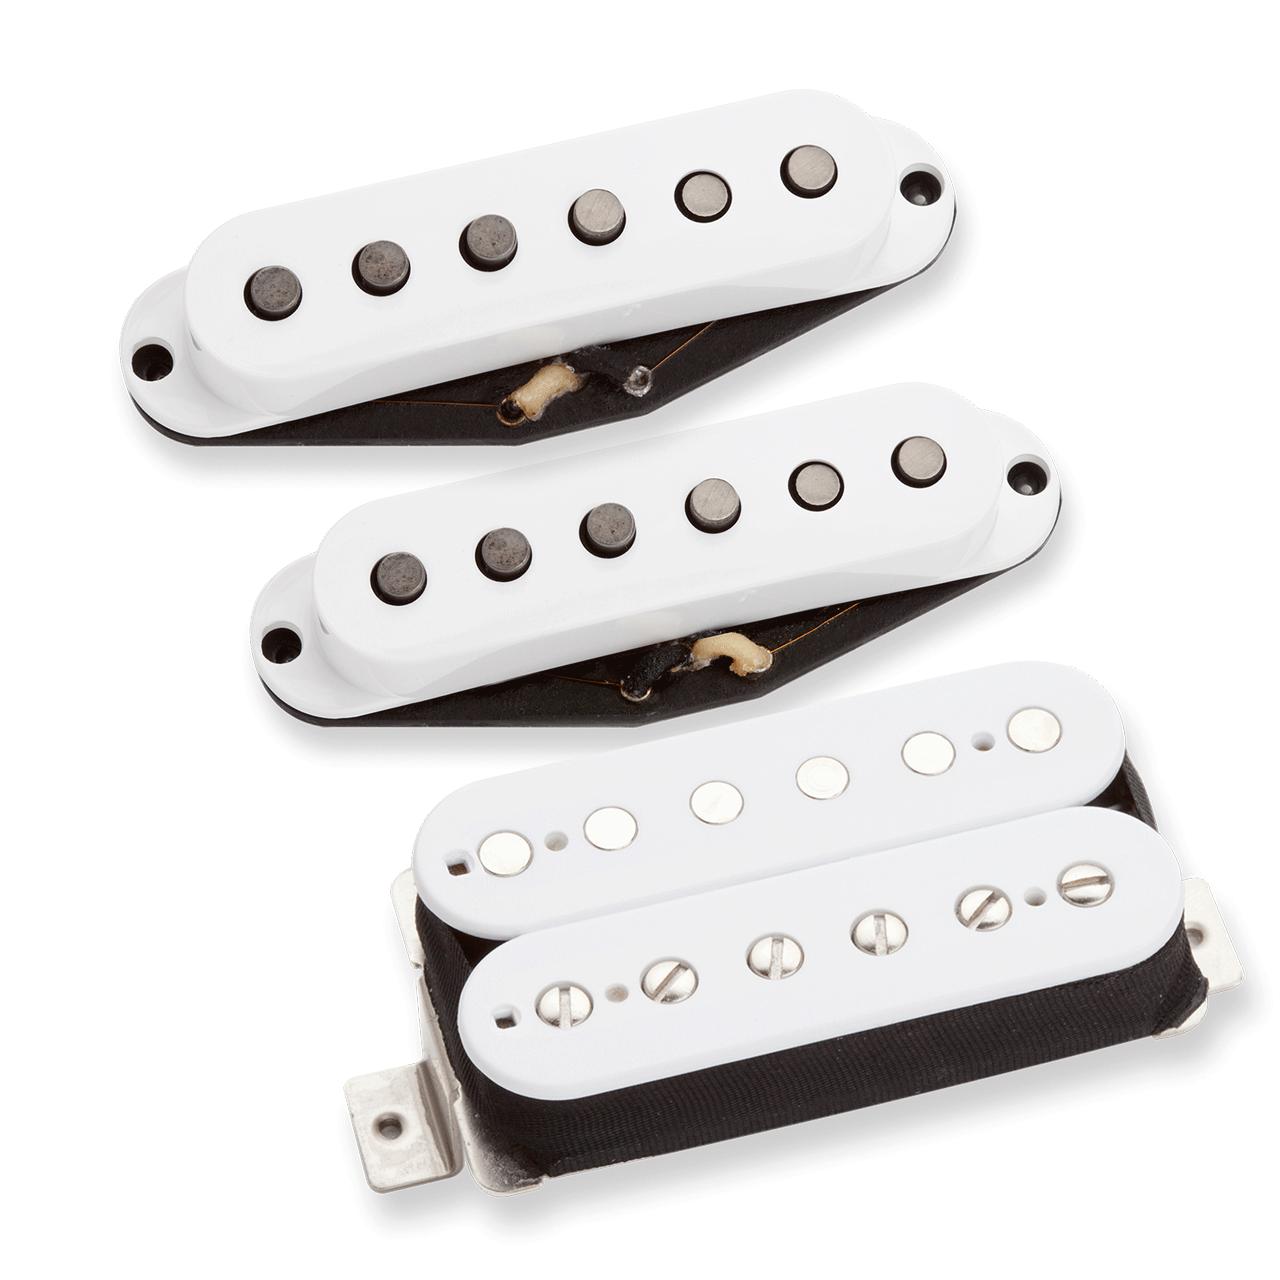 Tonerider Alnico II HSS Pickup Set - white, F-Spaced bridge